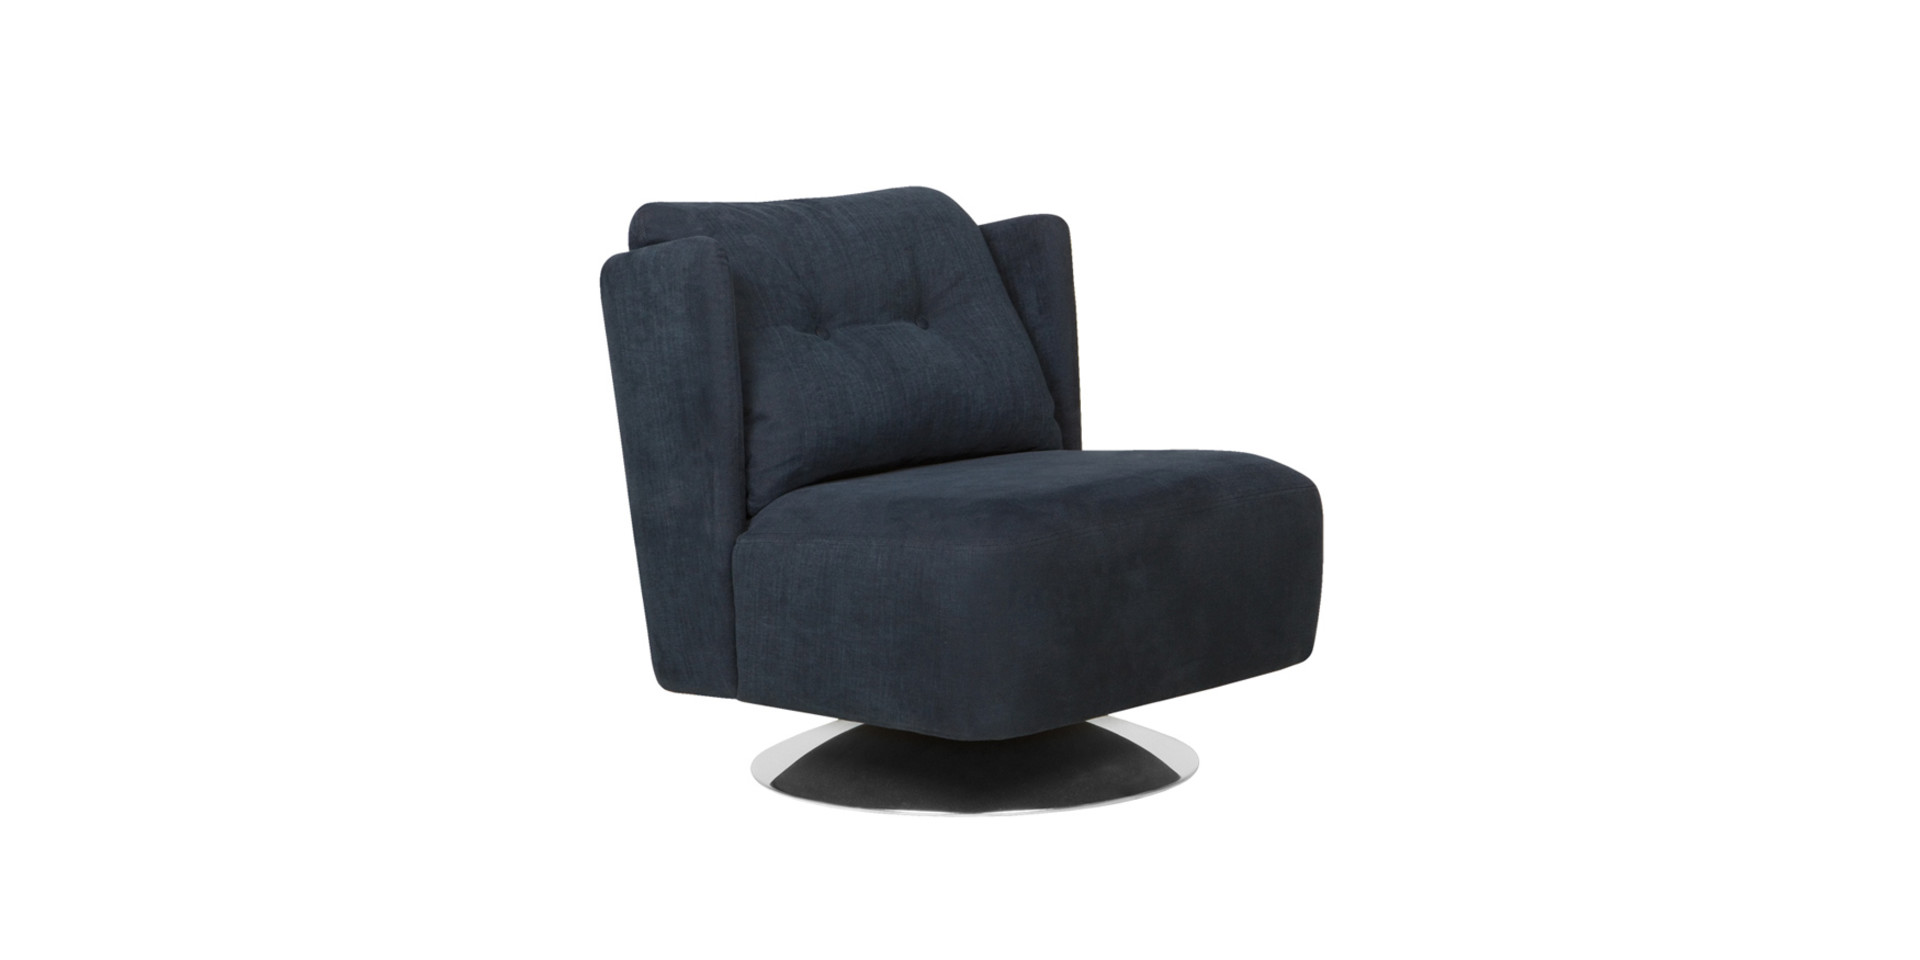 ALMA_armchair_swivel_buttons_caleido1424_black_2_0